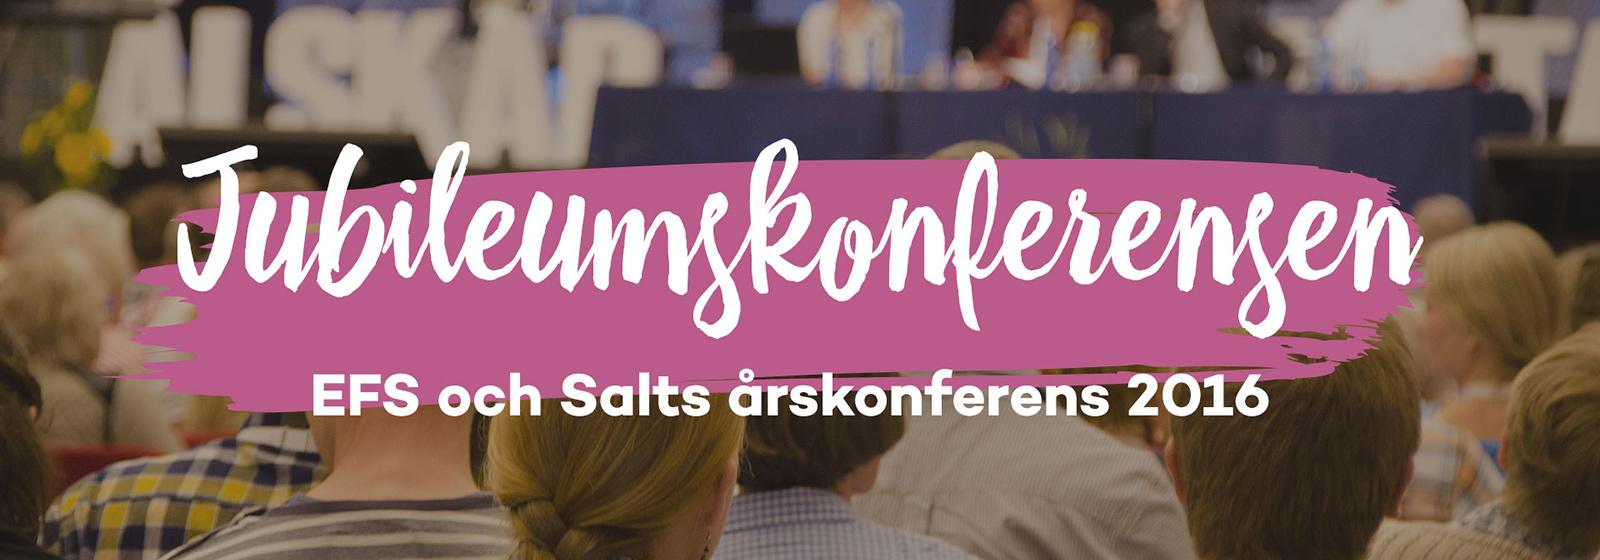 Årskonferens 2016 EFS och Salt. Jubileumskonferens